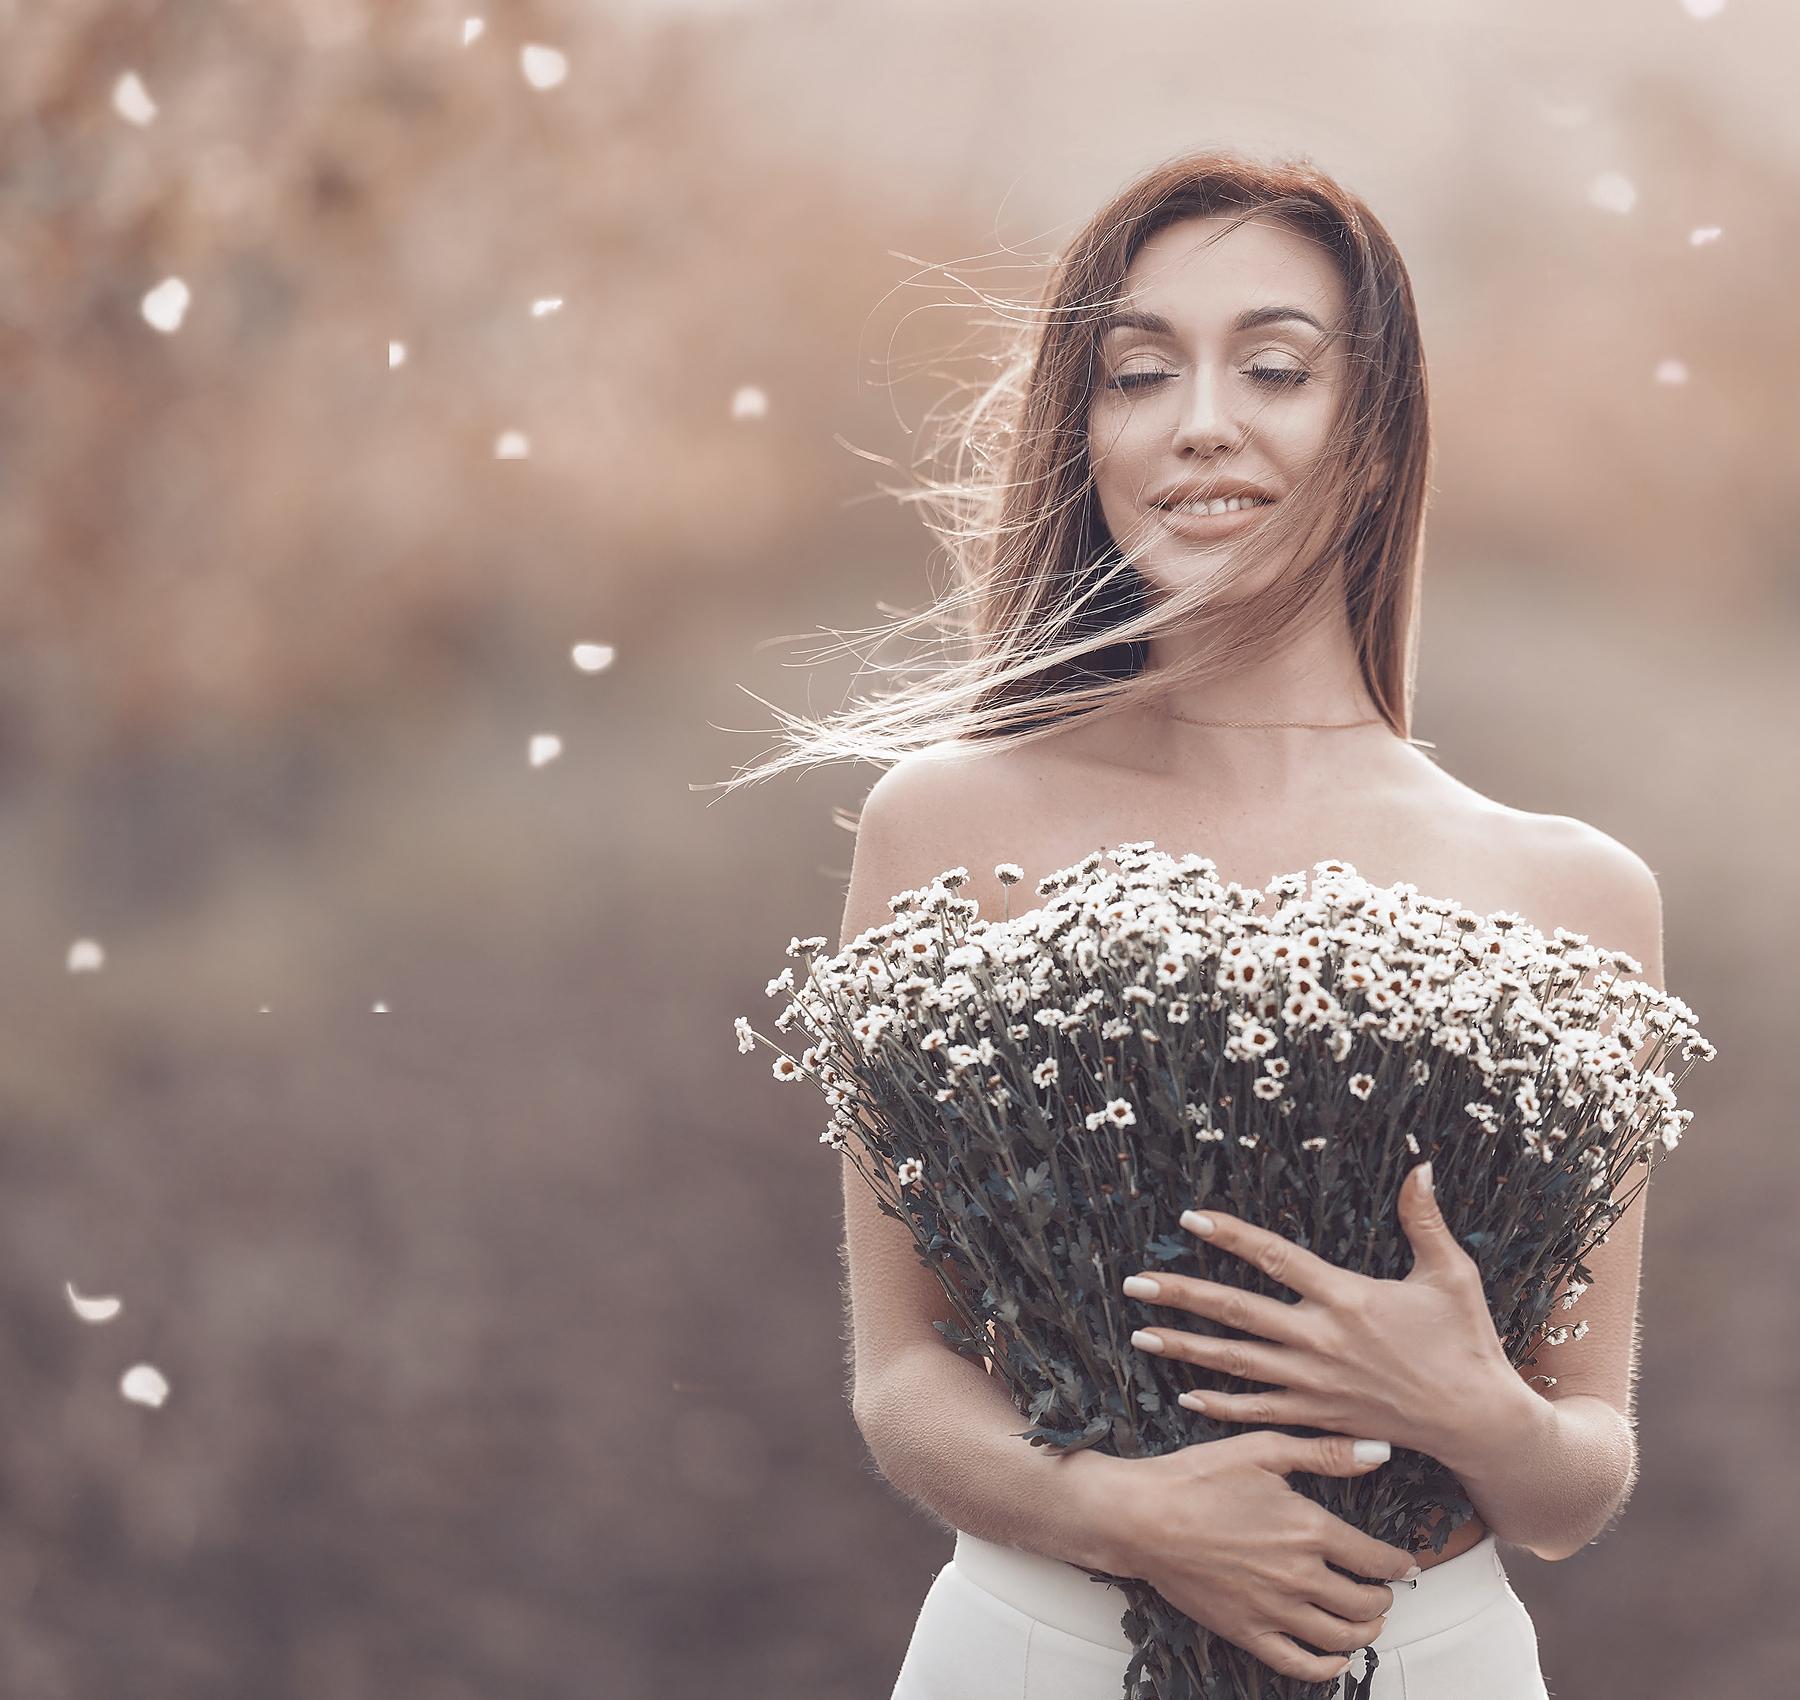 Мой Мир - мои правила / фото Photographyzp Yana